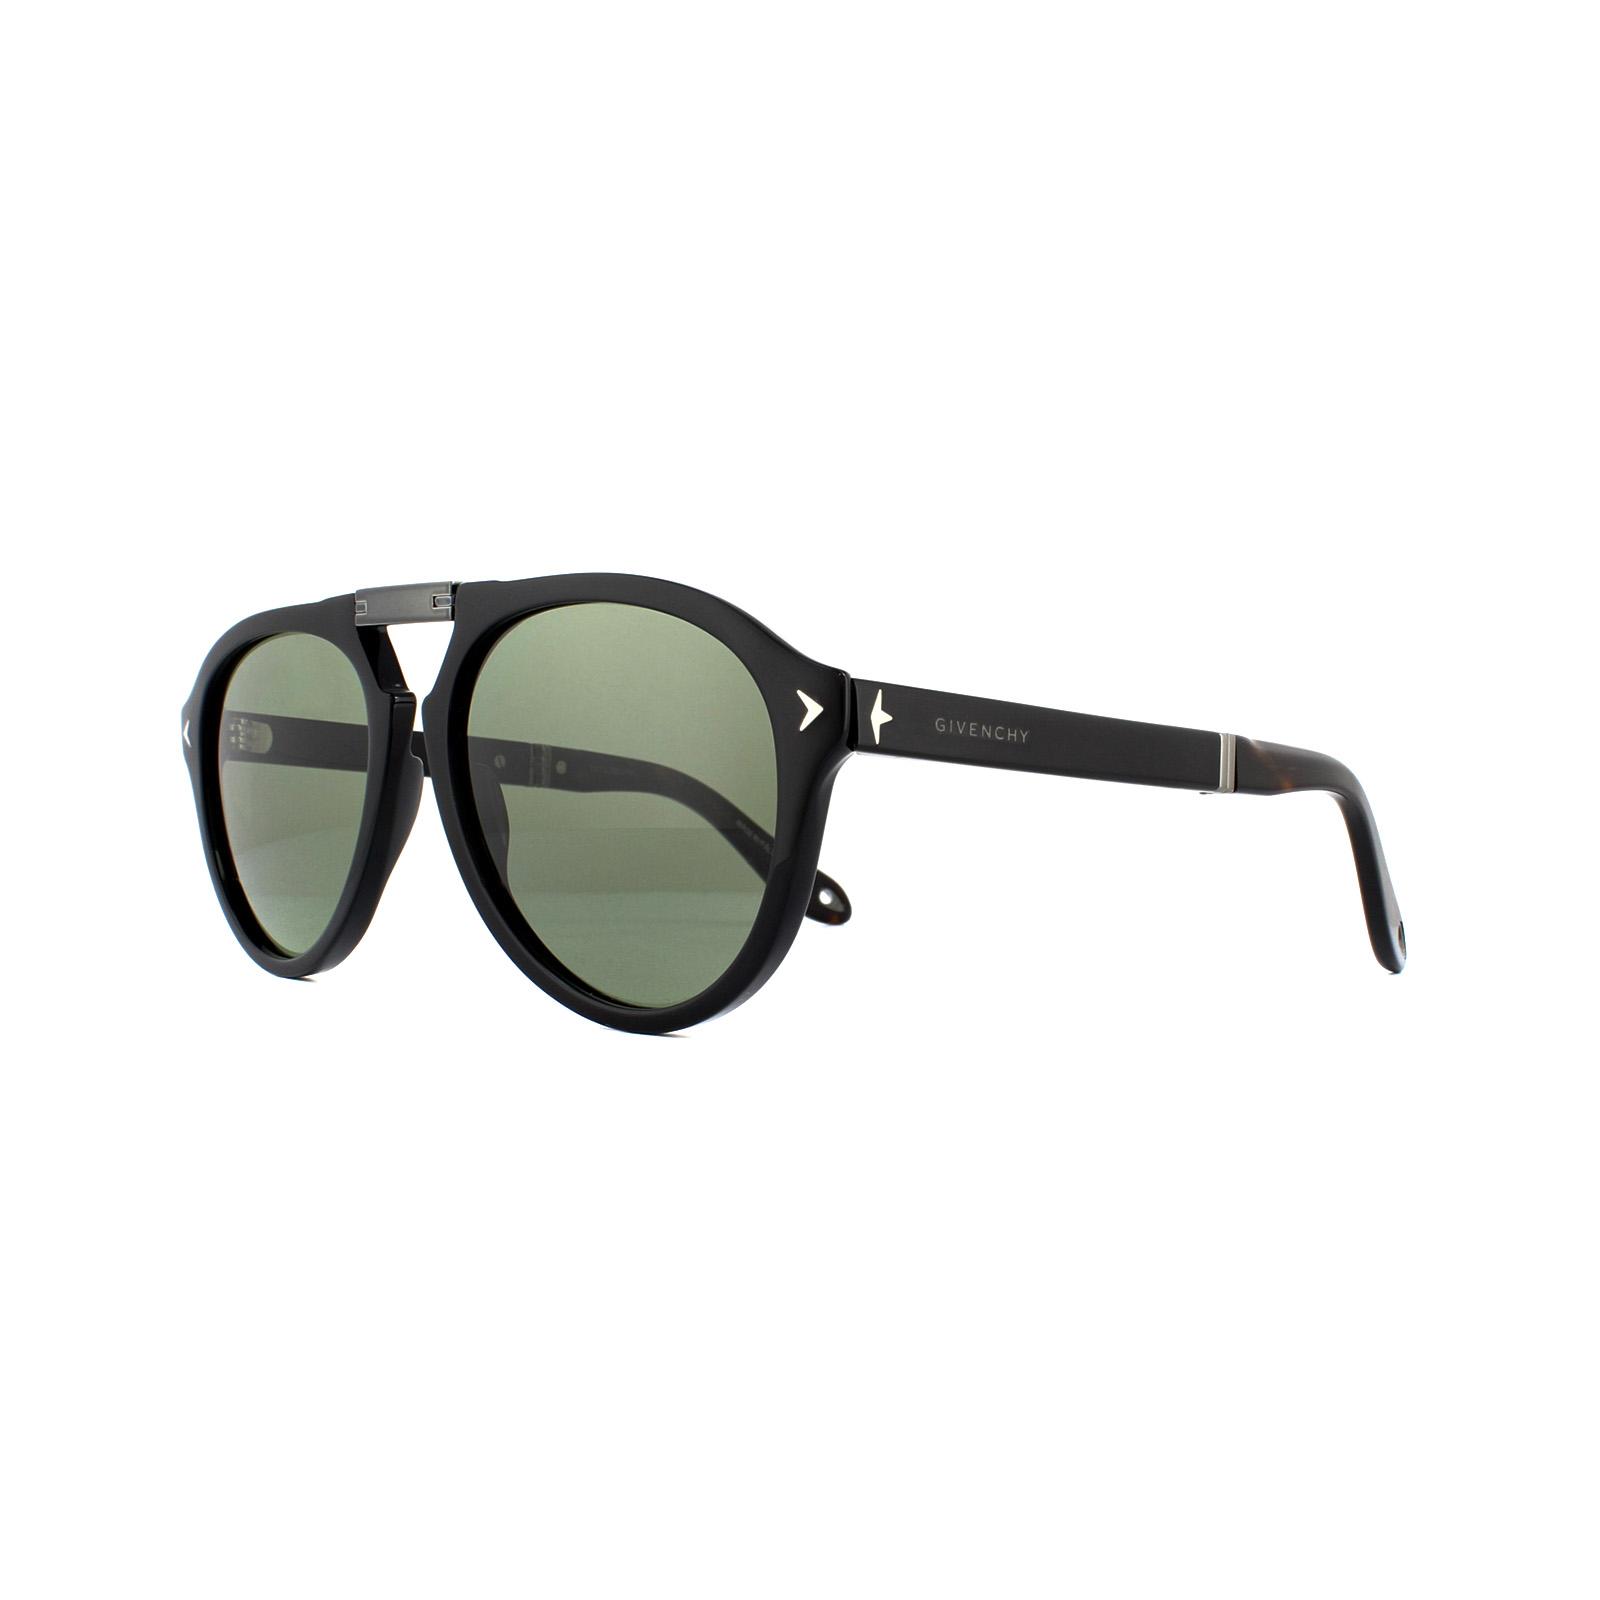 8eca09b3a08 Givenchy Sunglasses SGV7035 S 807 HY Black Green 762753408587